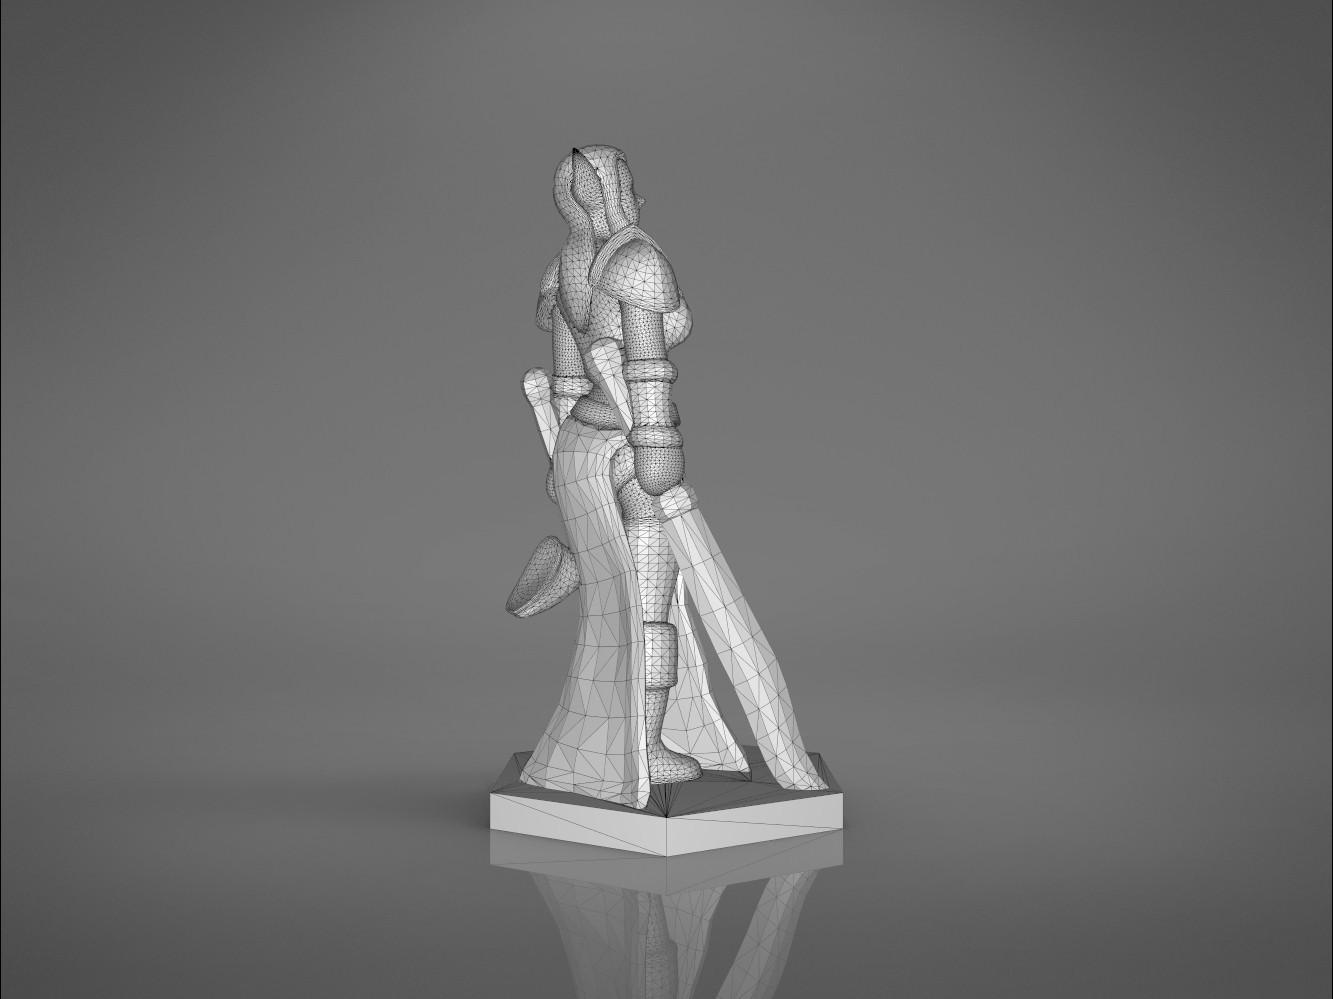 Warrior_2-left_perspective.333.jpg Download STL file ELF WARRIOR FEMALE CHARACTER GAME FIGURE 3D print model • 3D printing object, 3D-mon